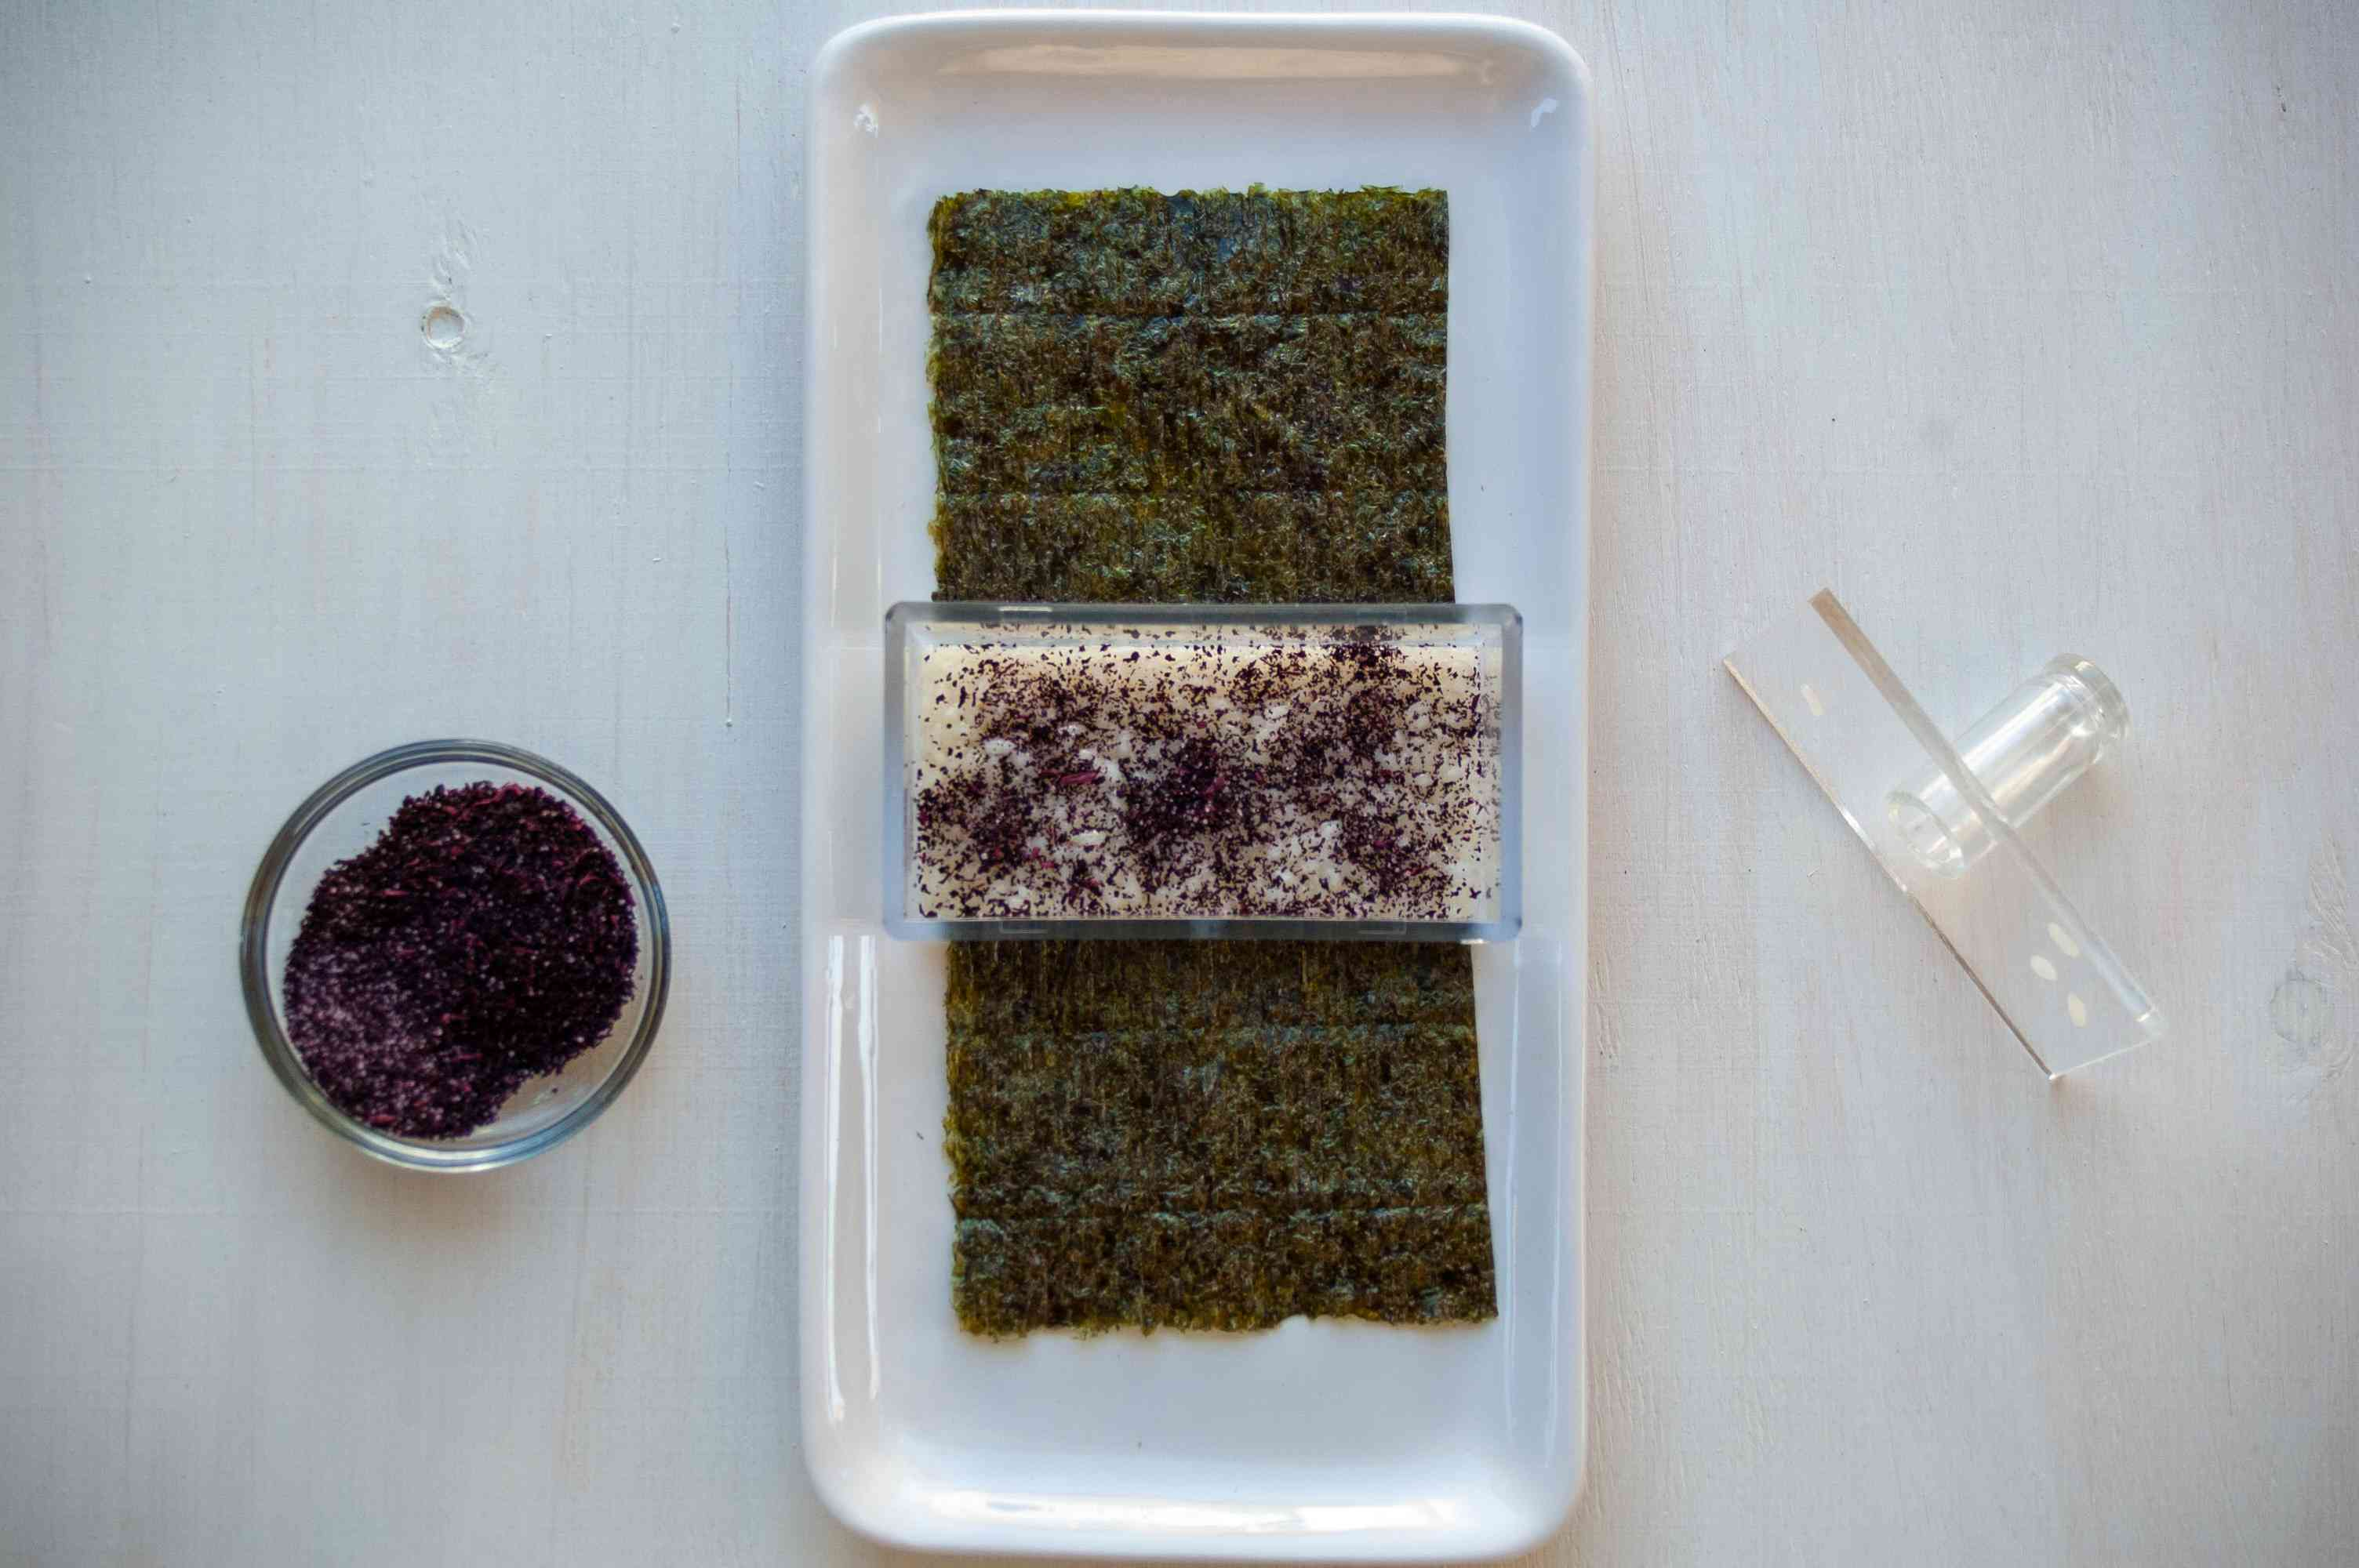 furikake on rice and nori